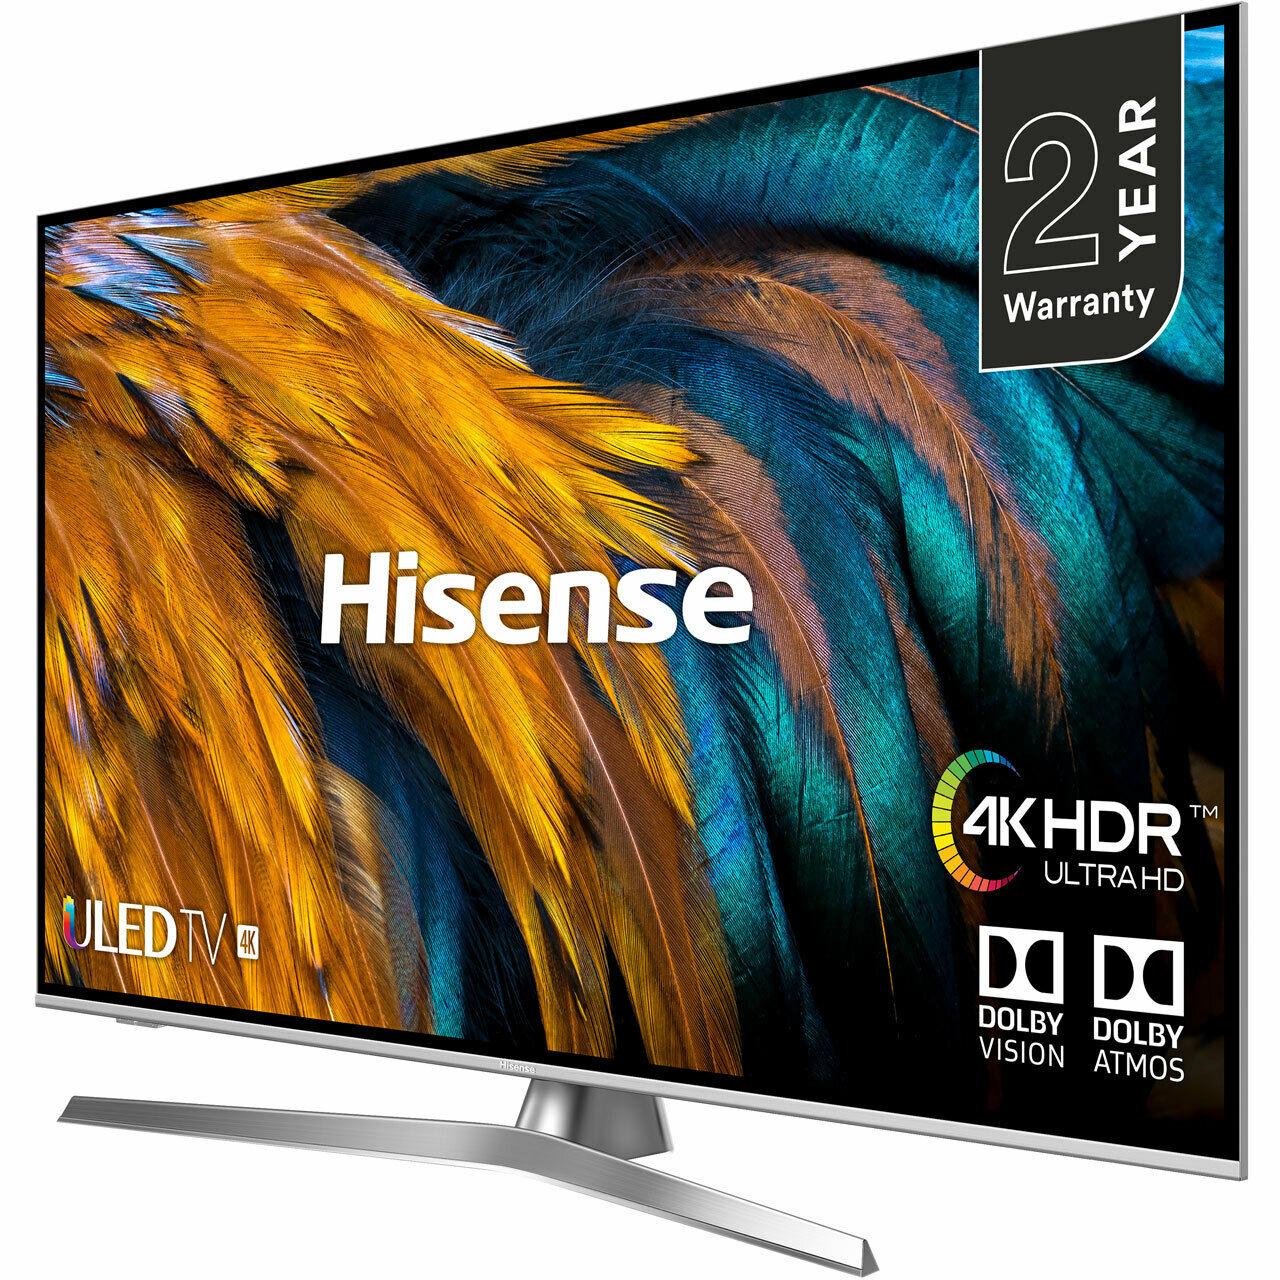 Hisense H55U7BUK U7B 55 Inch TV Smart 4K Ultra HD LED Freeview HD 4 HDMI Dolby £449.10 @ AO ebay (10% off at checkout)